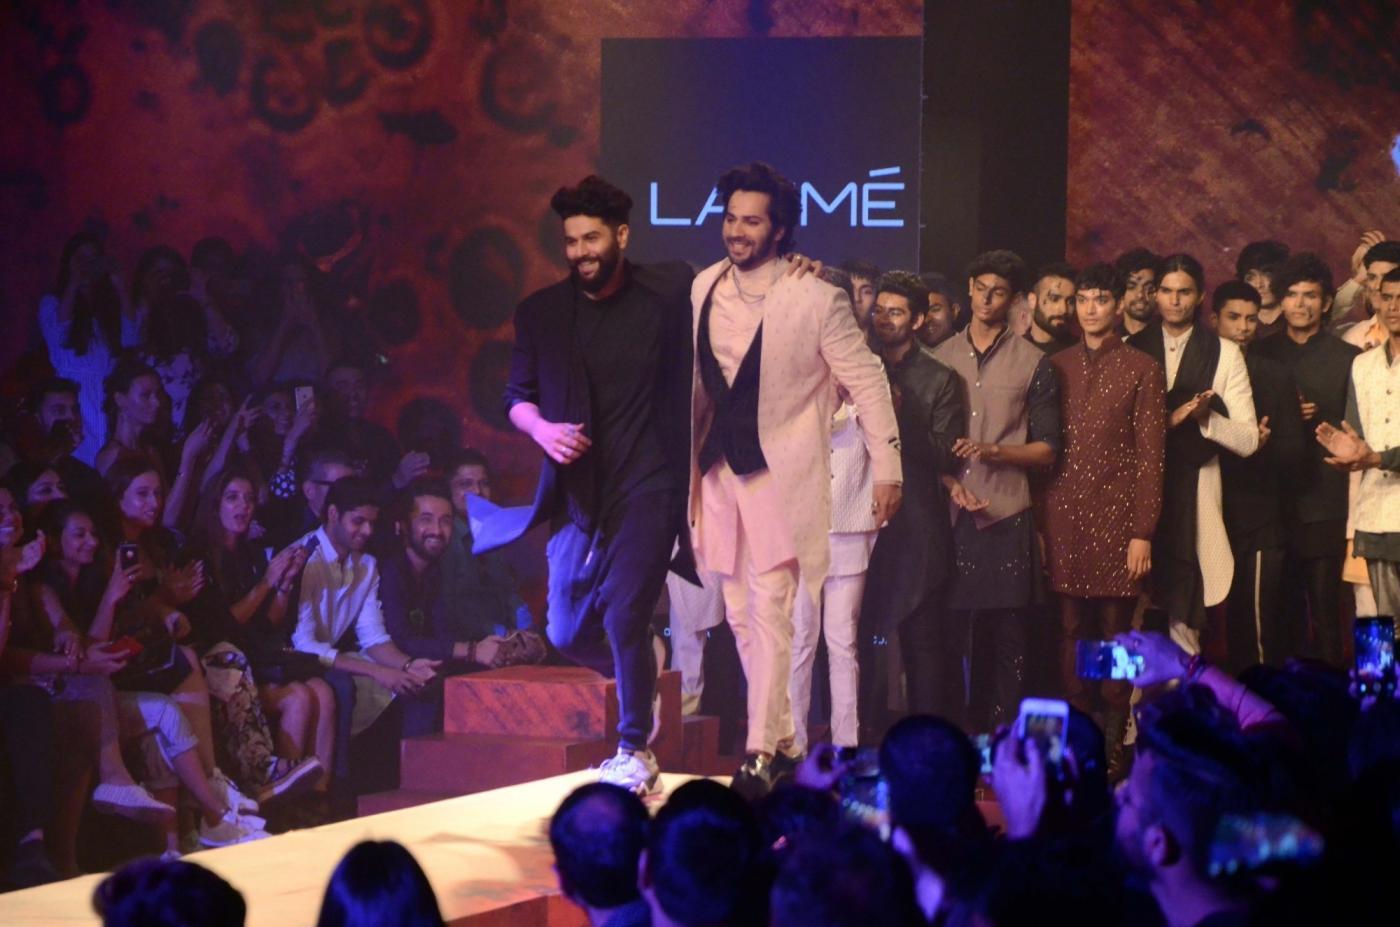 Mumbai: Actor Varun Dhawan with fashion designer Kunal Rawal at the Lakme Fashion Week Winter/Festive 2018, in Mumbai on Aug 25, 2018. (Photo: IANS) by .